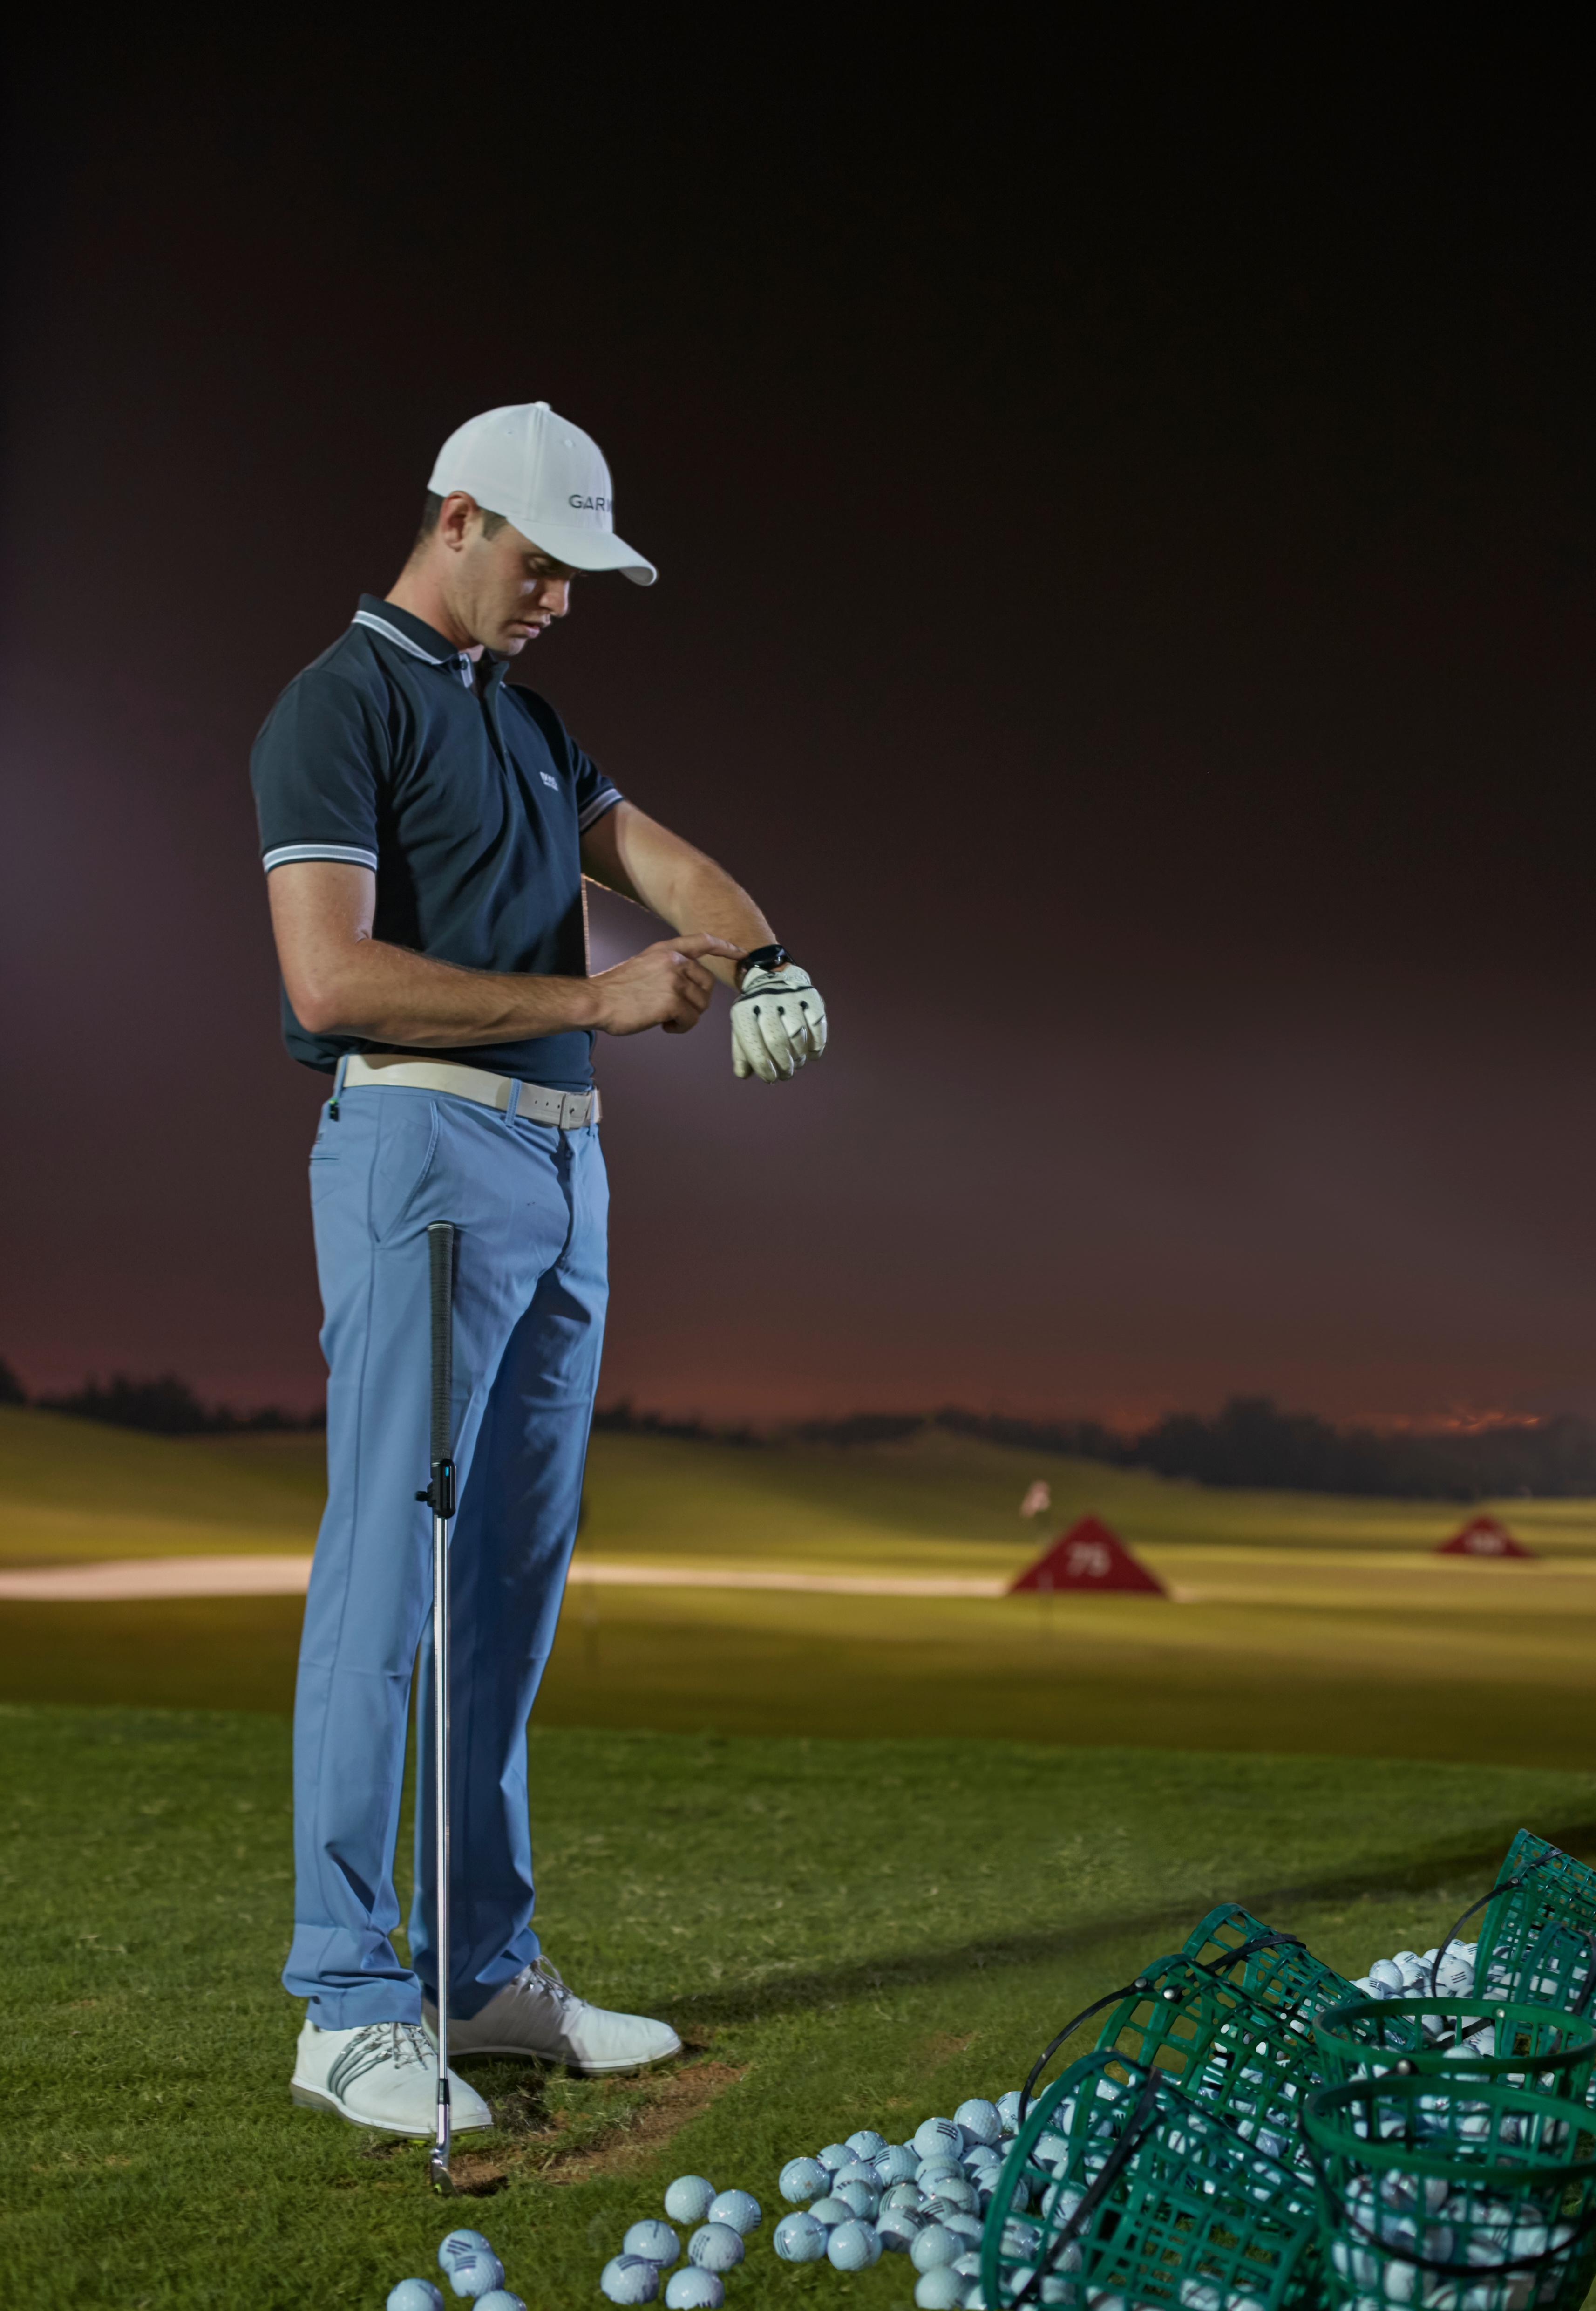 Amazon Garmin TruSwing Golf Club Sensor Cell Phones